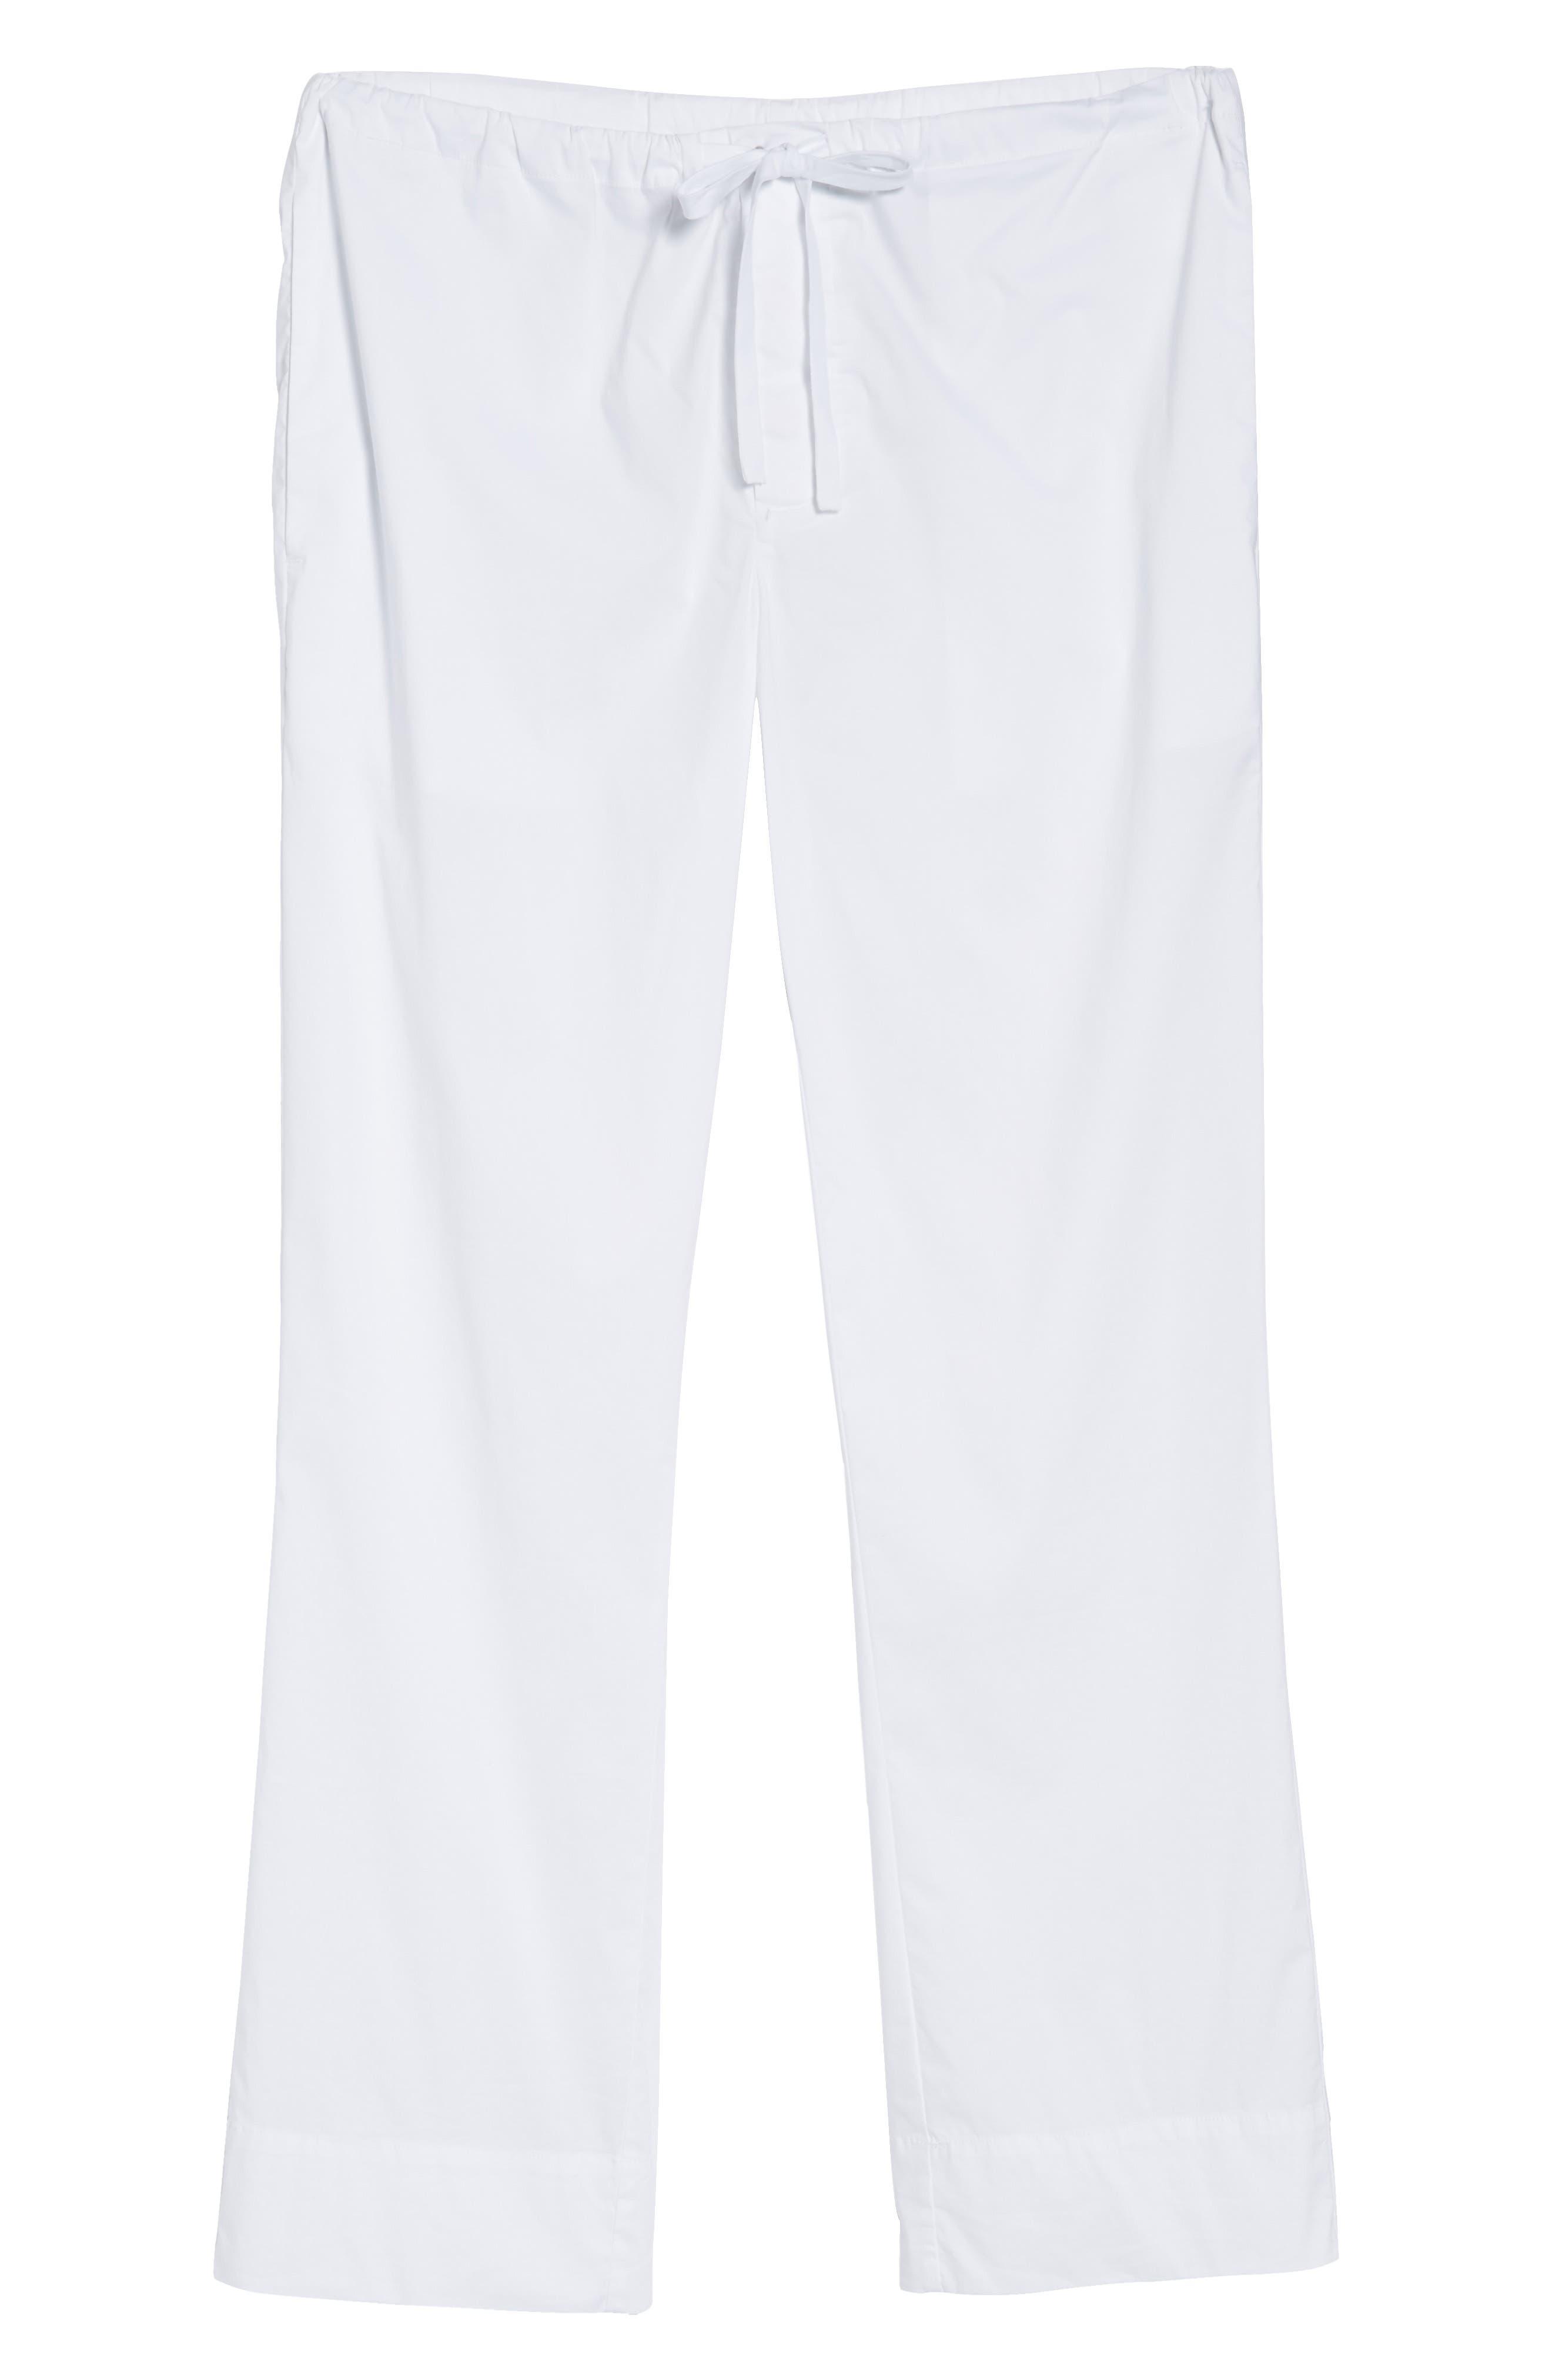 Drawstring Waist Pants,                             Alternate thumbnail 6, color,                             White